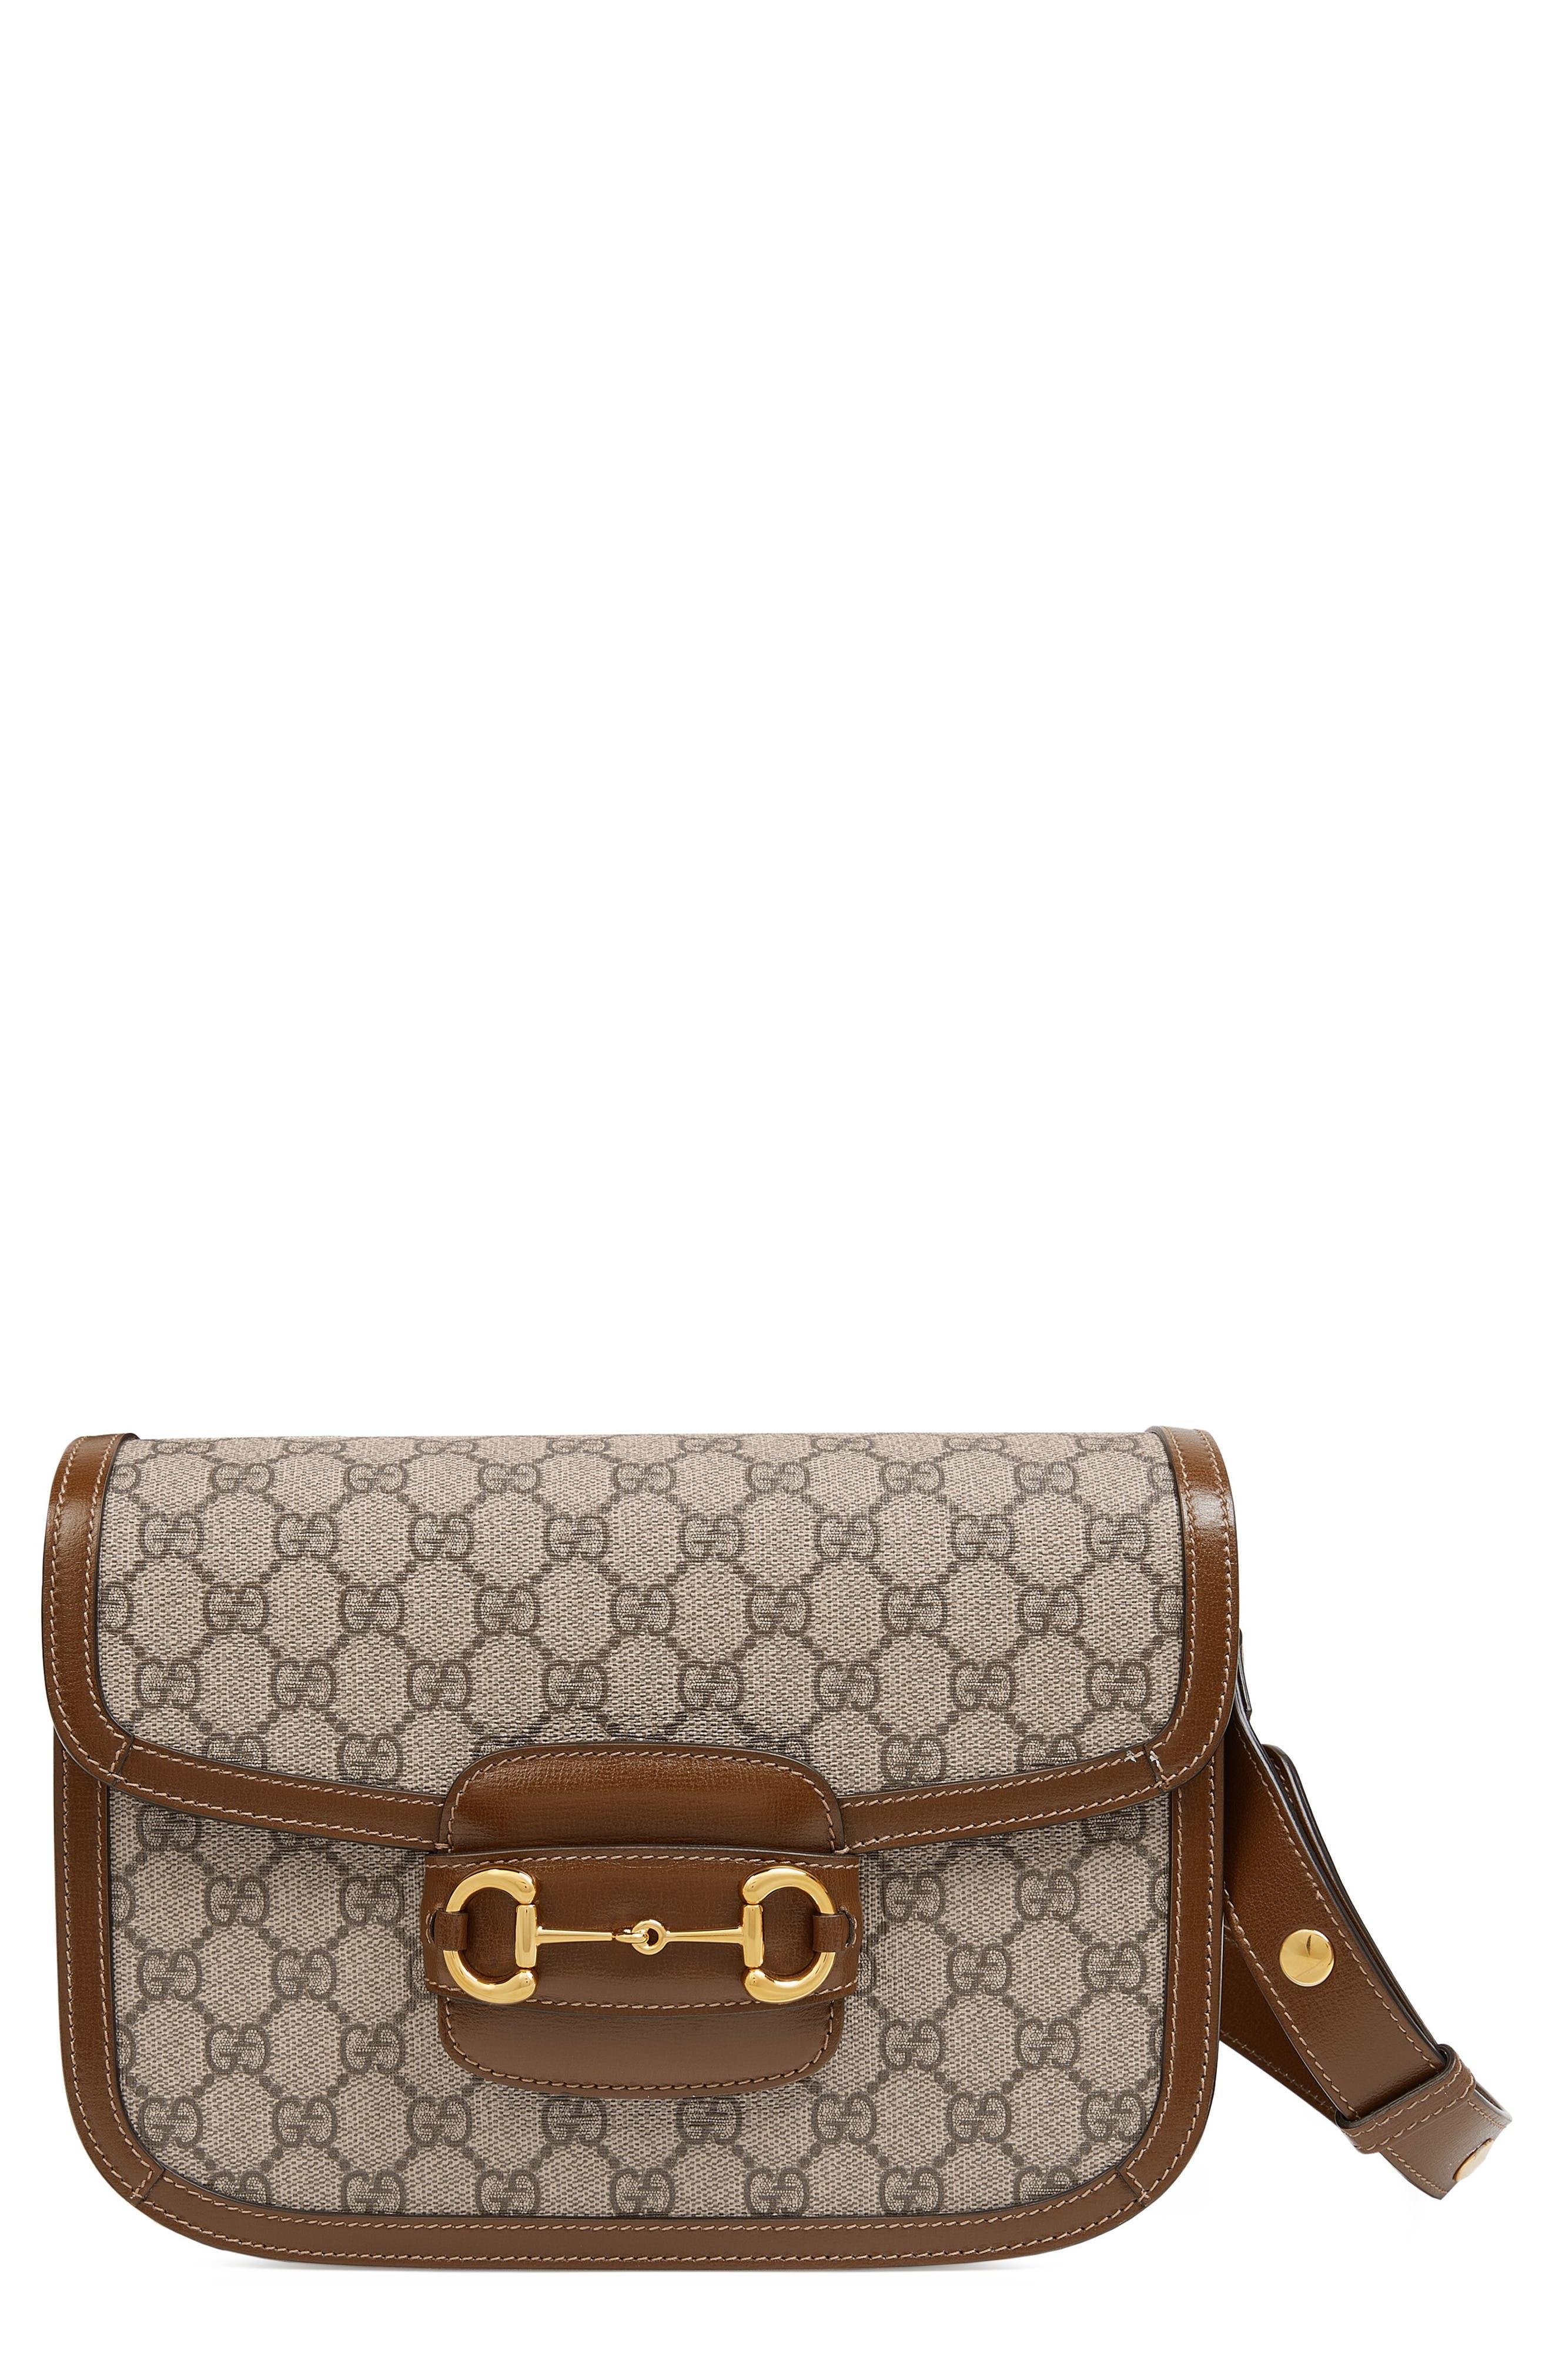 Gucci Shoulder 1955 Horsebit GG Supreme Canvas Shoulder Bag